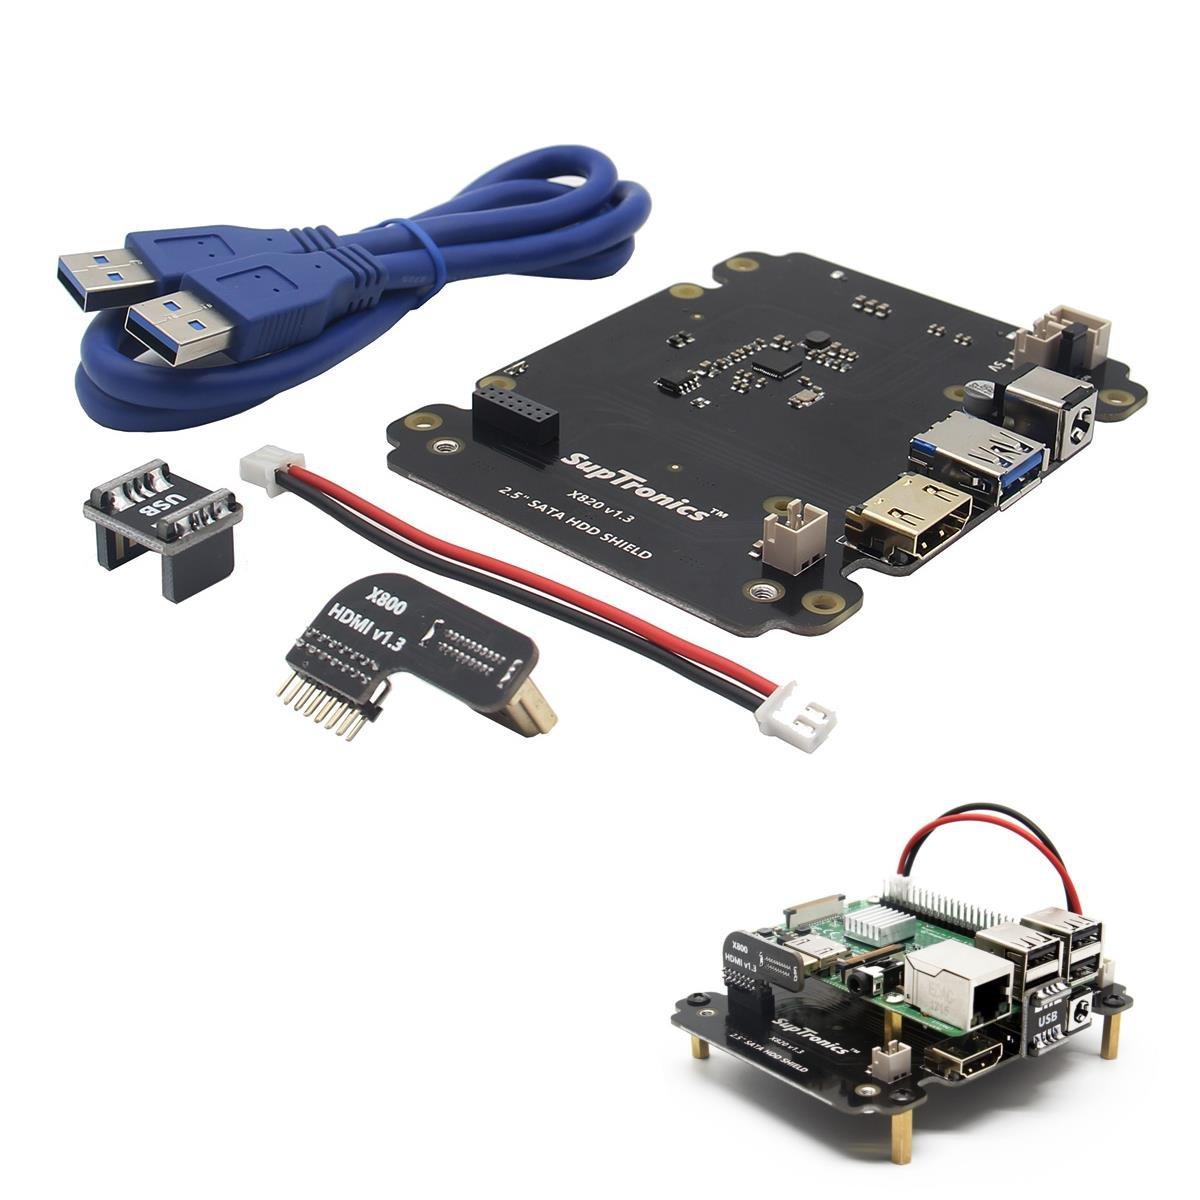 Ils - X820 2.5 Pulgadas SATA HDD/SSD Tarjeta de Expansió de ...